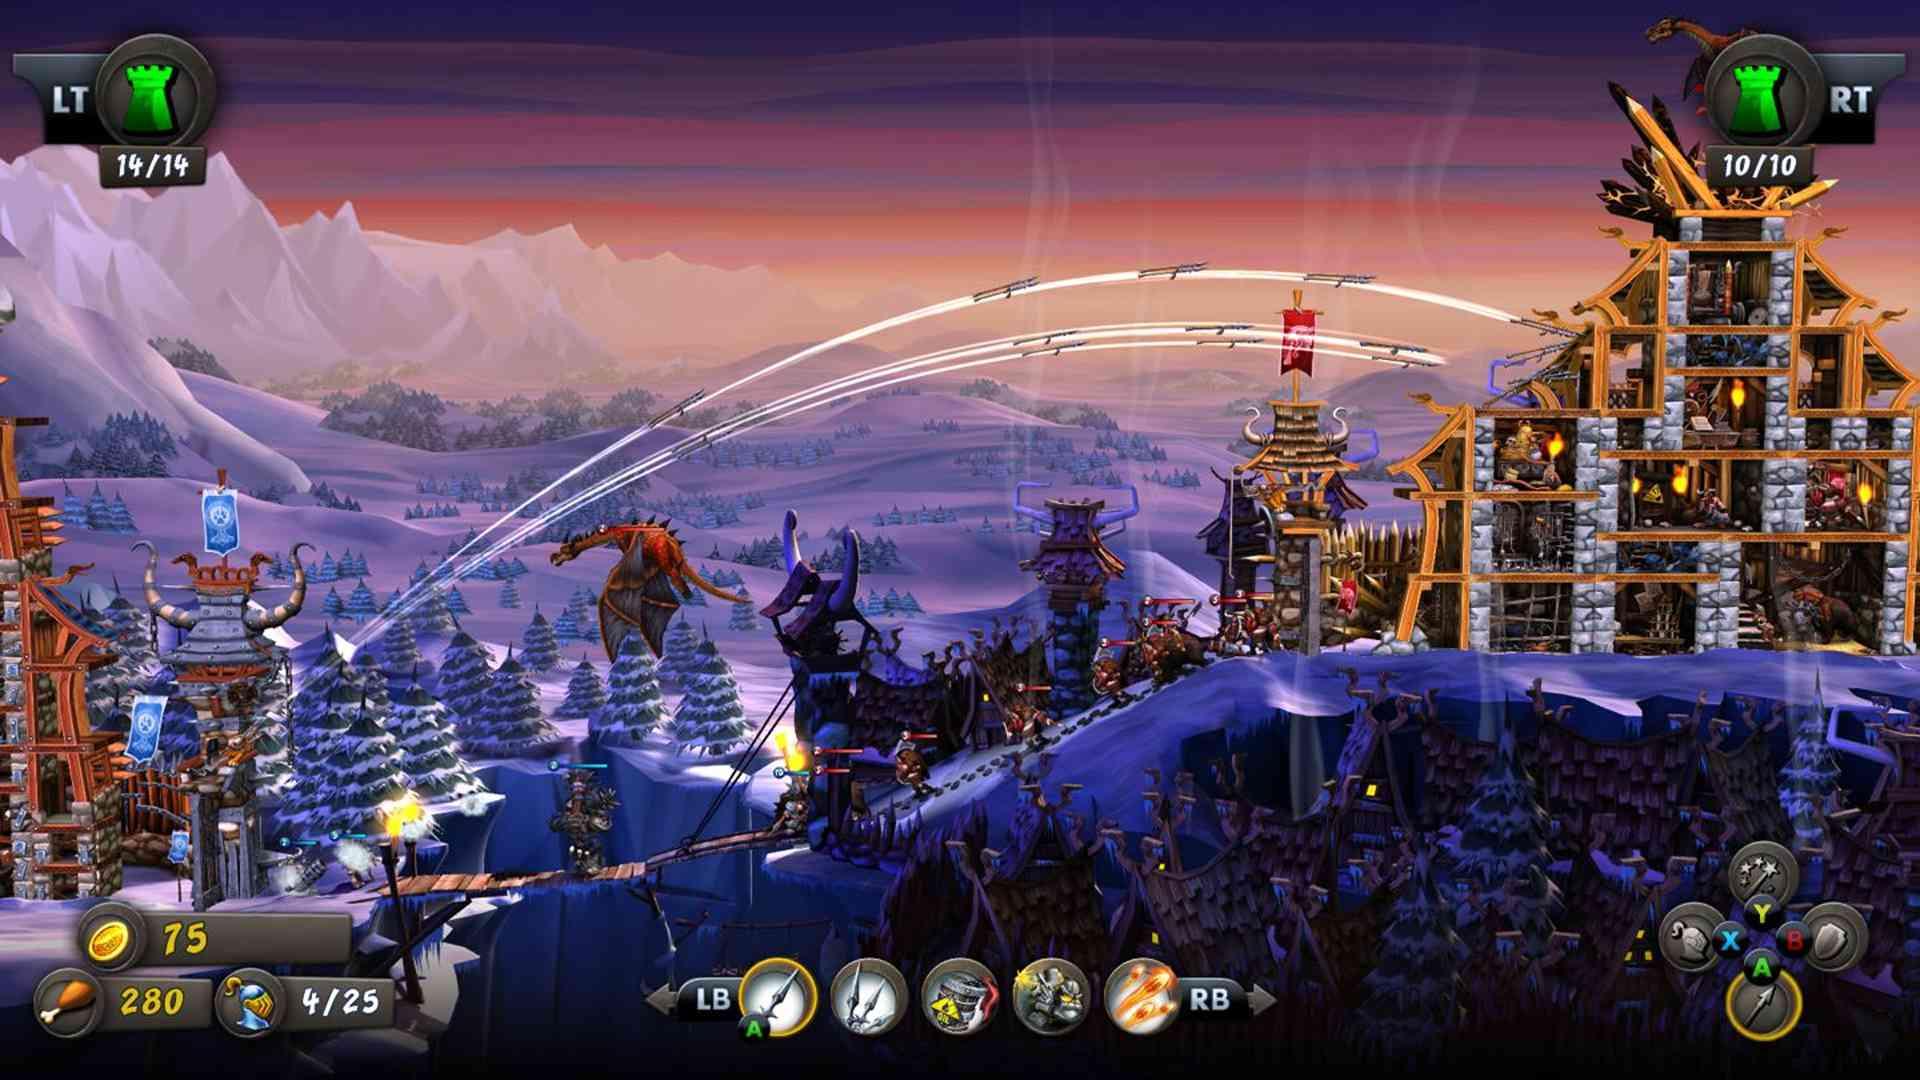 CastleStorm tower defense offline strategy video game.